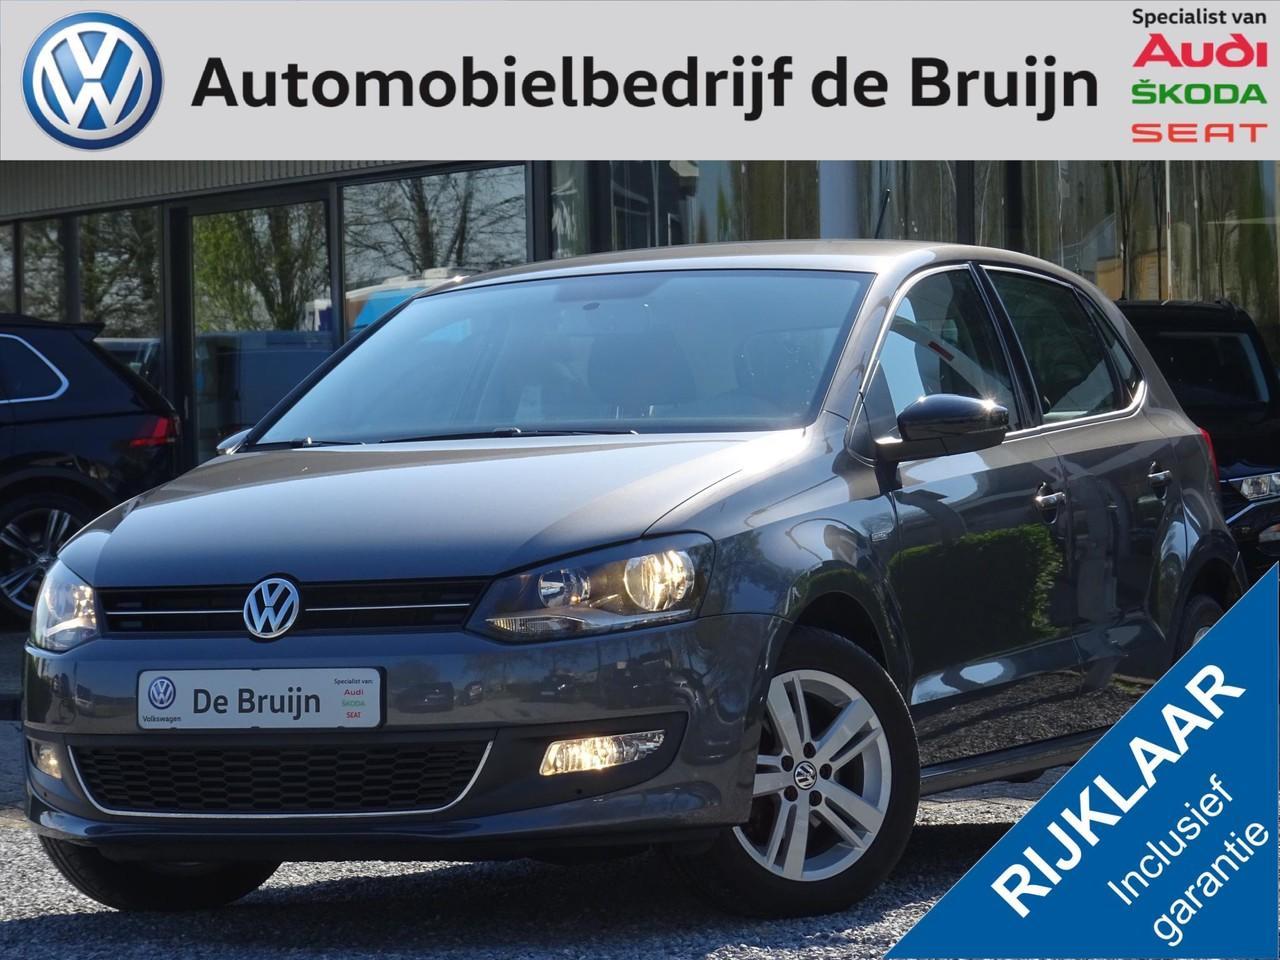 Volkswagen Polo 1.2 70pk 5d match (lm,sportstoelen,airco,multi-stuur)